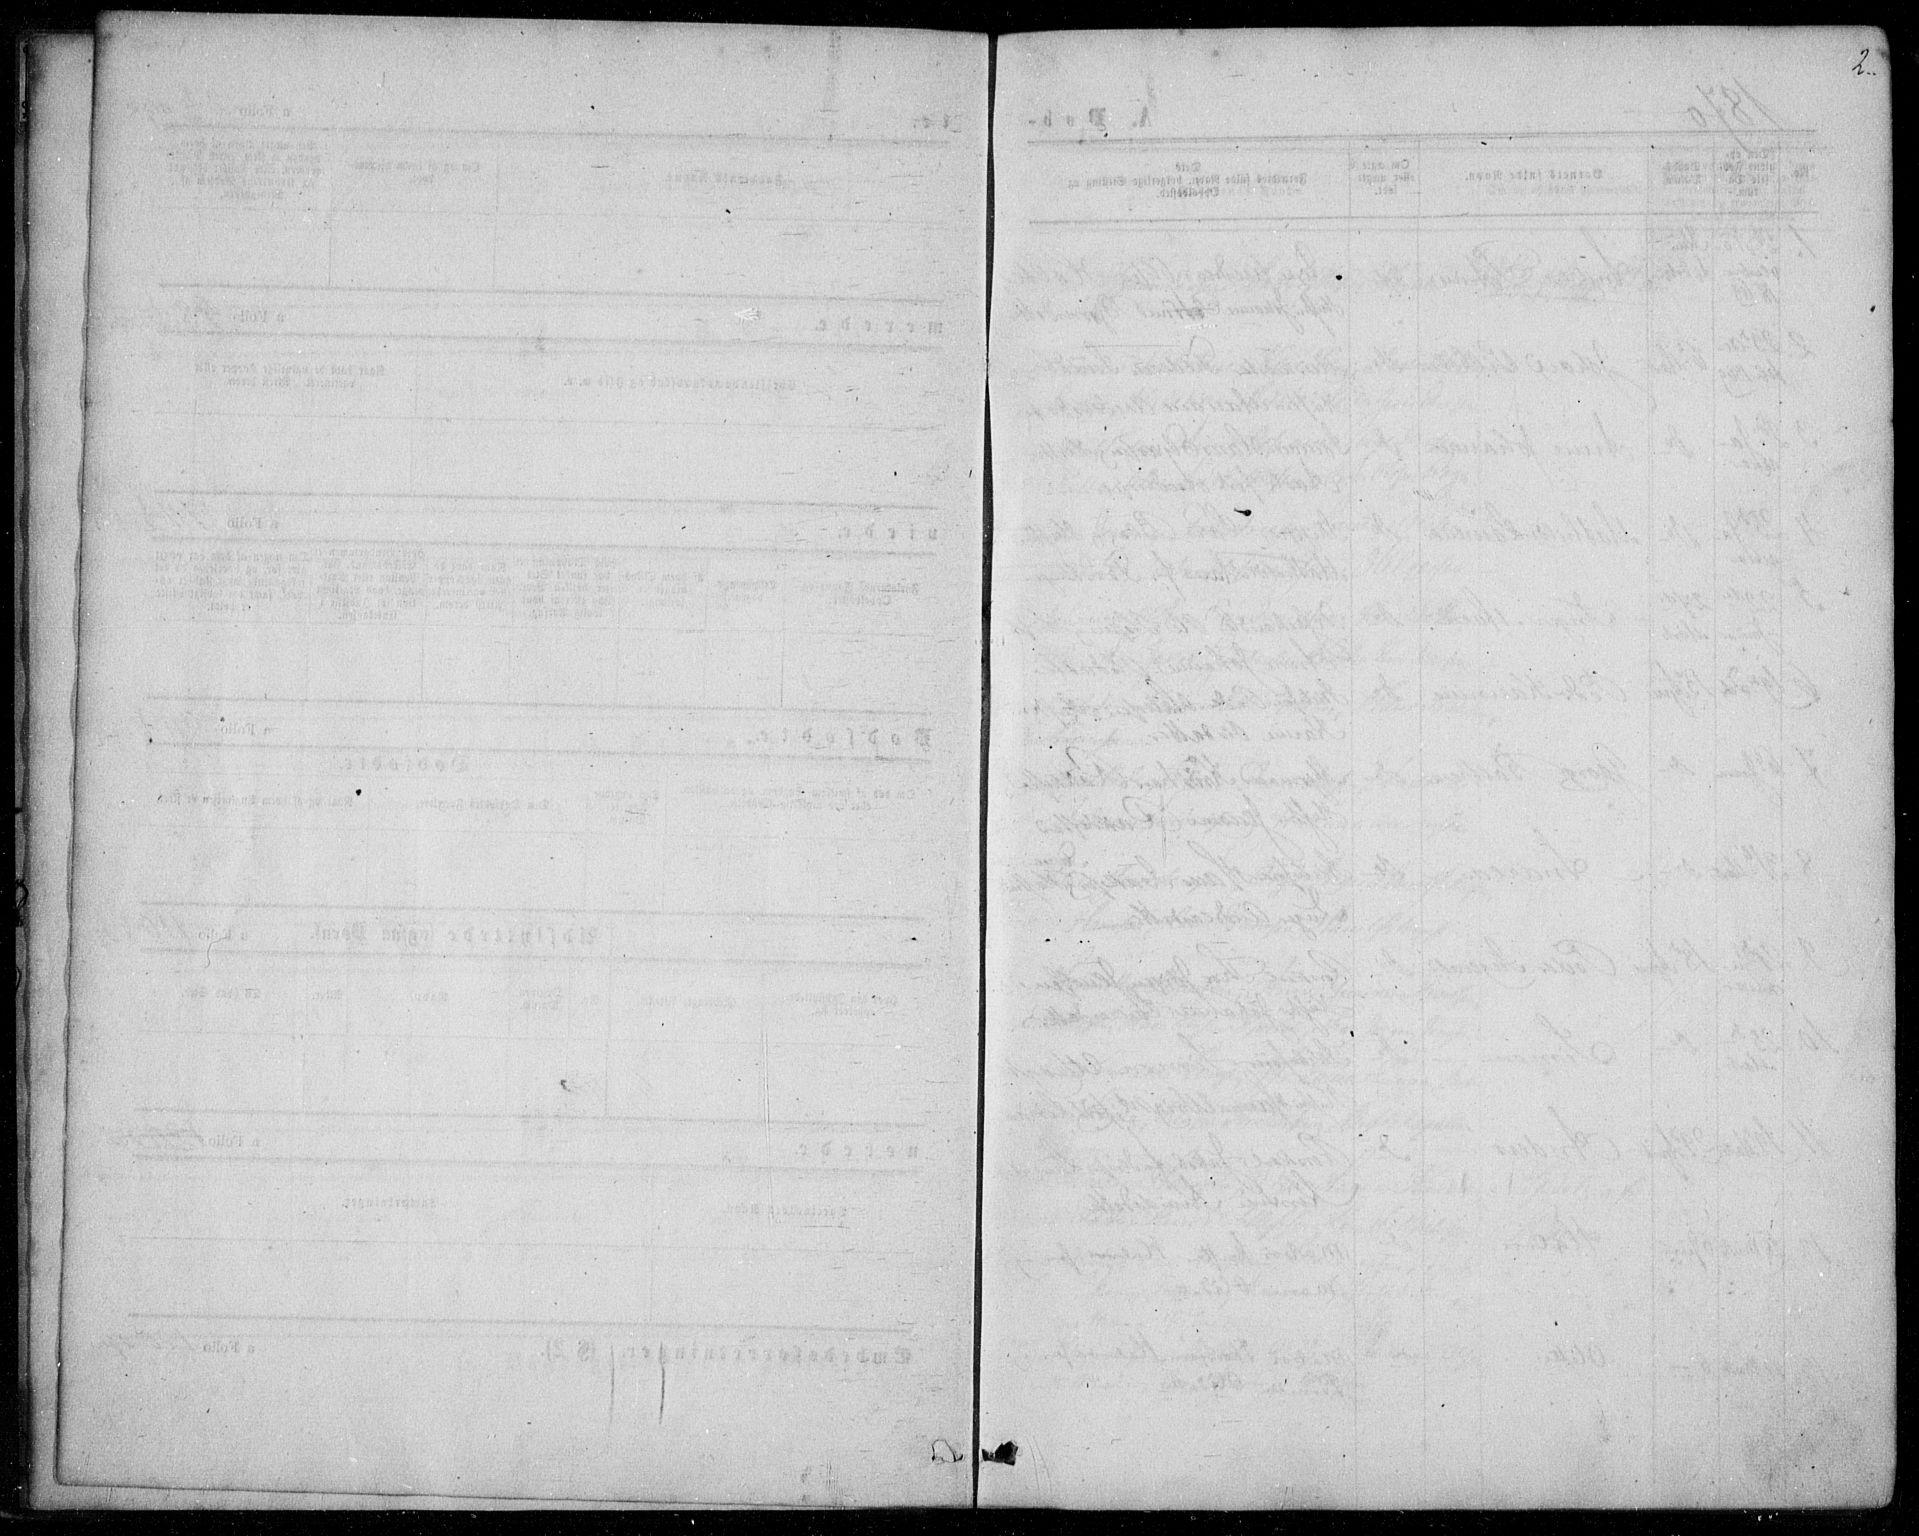 SAKO, Langesund kirkebøker, F/Fa/L0001: Ministerialbok nr. 1, 1870-1877, s. 2